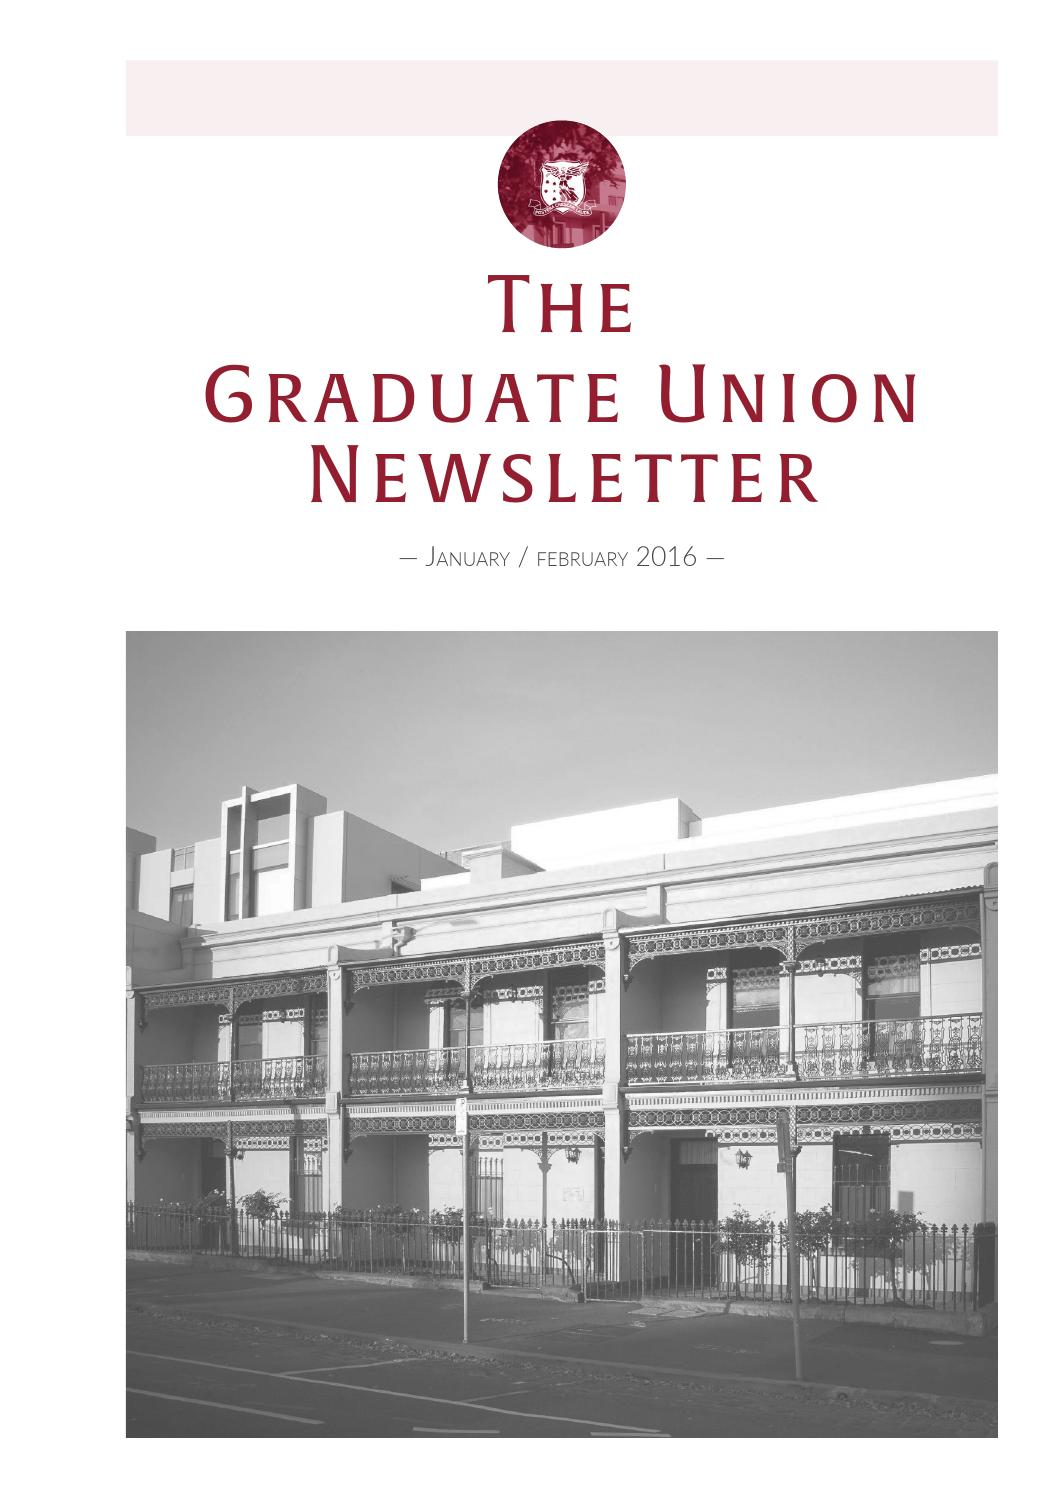 the graduate union january/february newsletter by graduate house